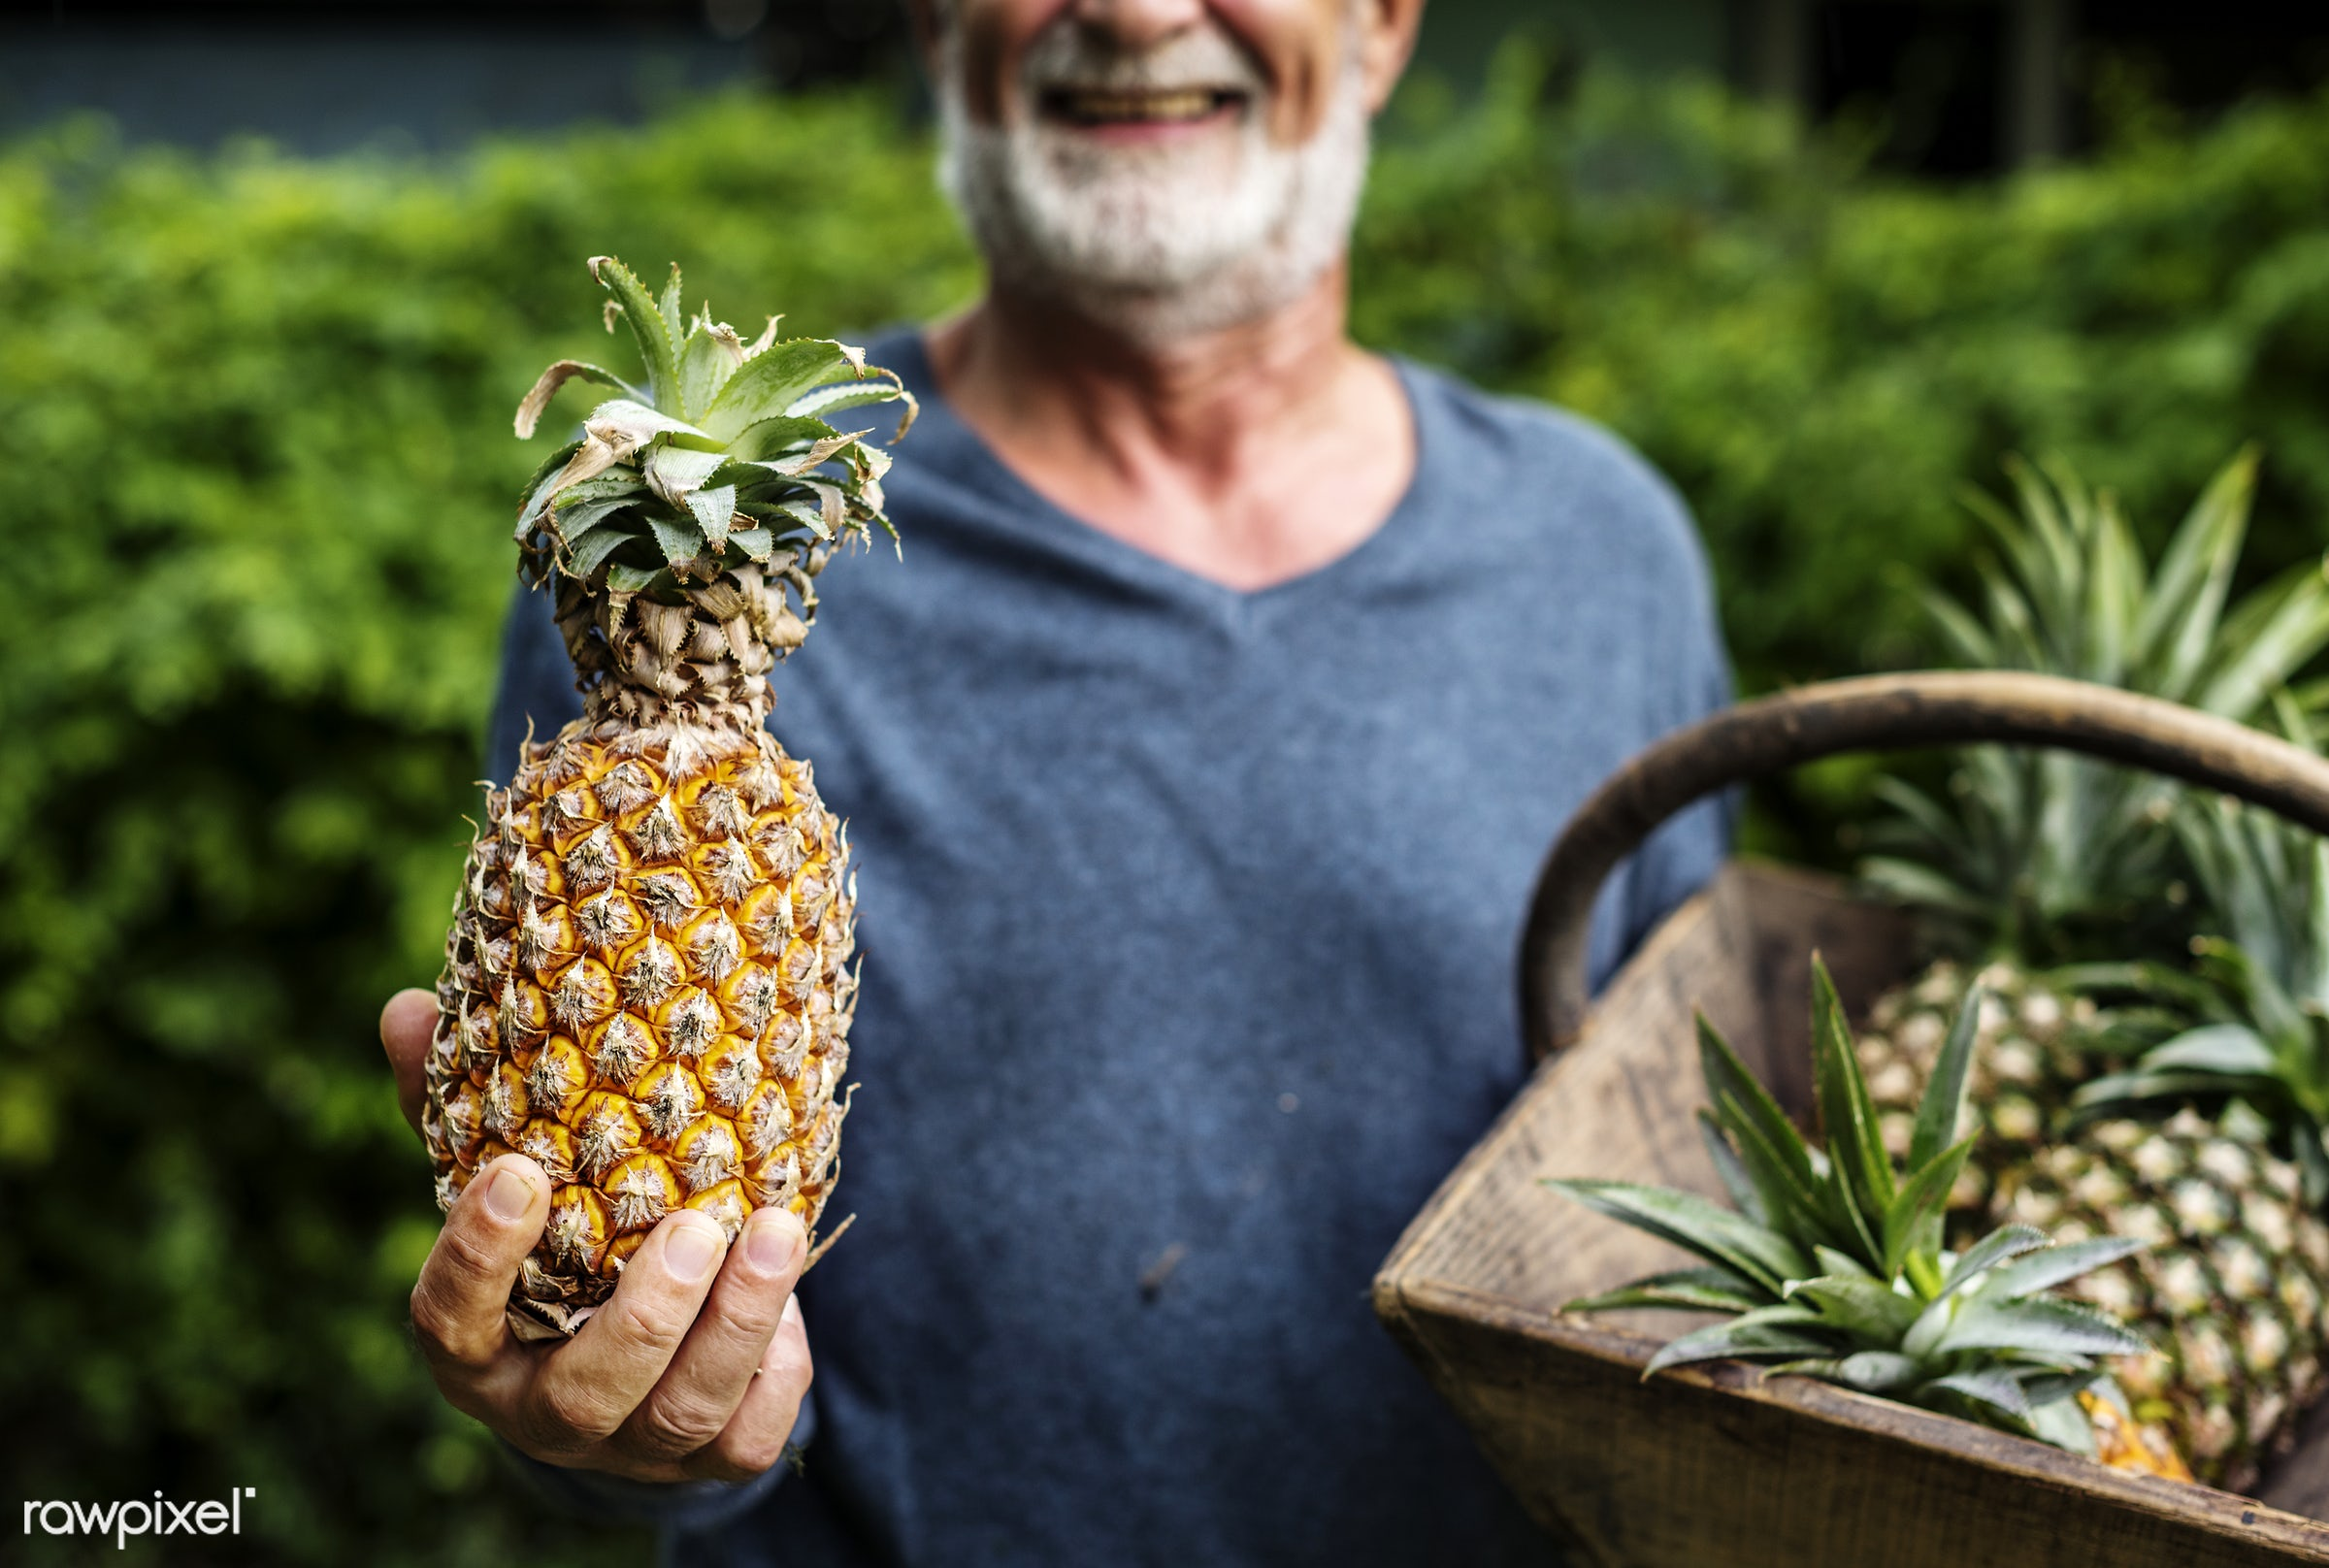 raw, holding, farm, nature, hands, fresh, closeup, man, fruit, organic, basket, healthy, harvest, pineapple, produce